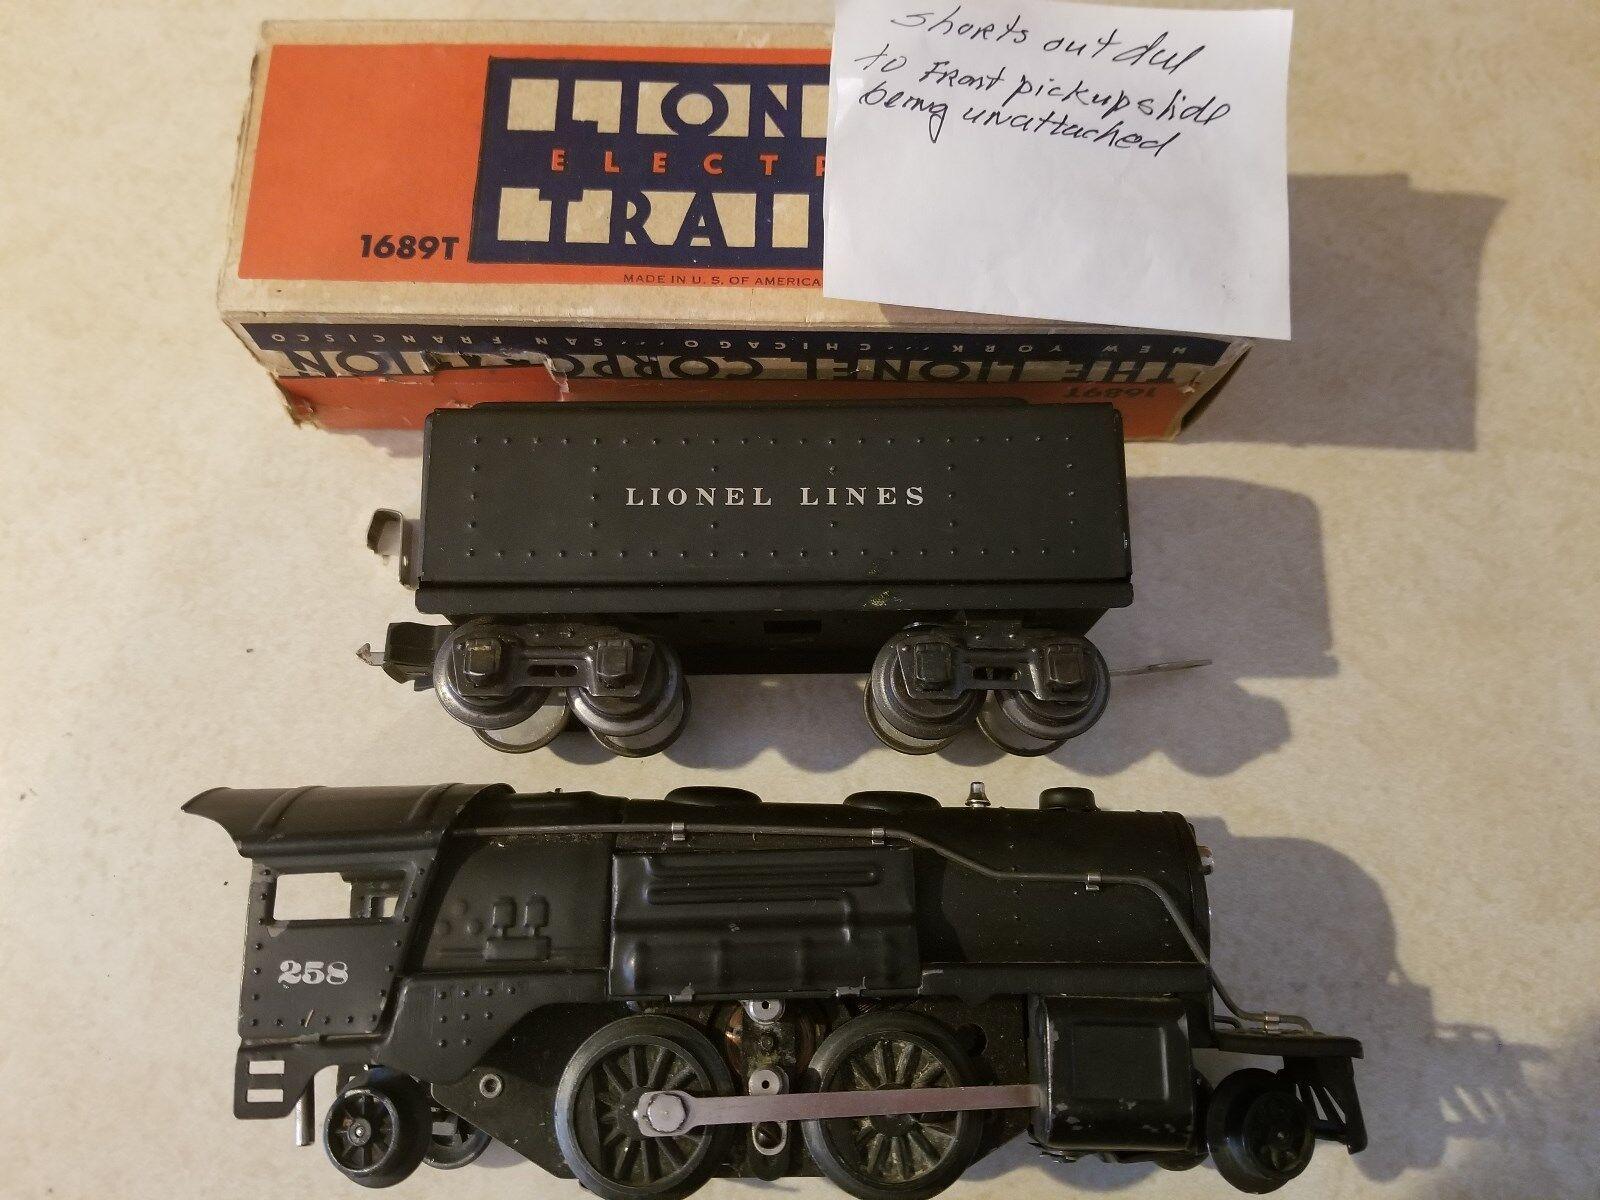 Lionel 258 2-4-2 Locomotive, late 'O' w 1689T Tender Prewar 30-35 (JS)